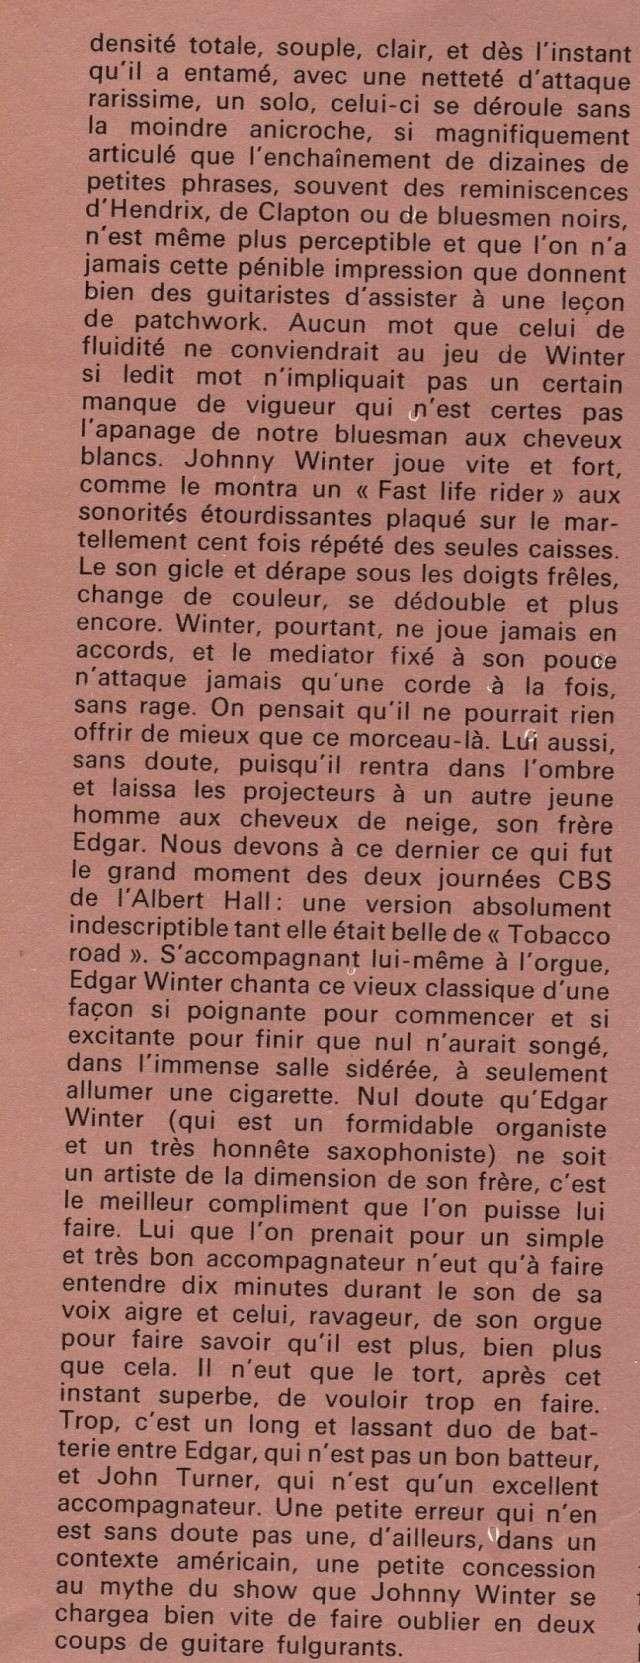 Johnny Winter (1969) R40-0213